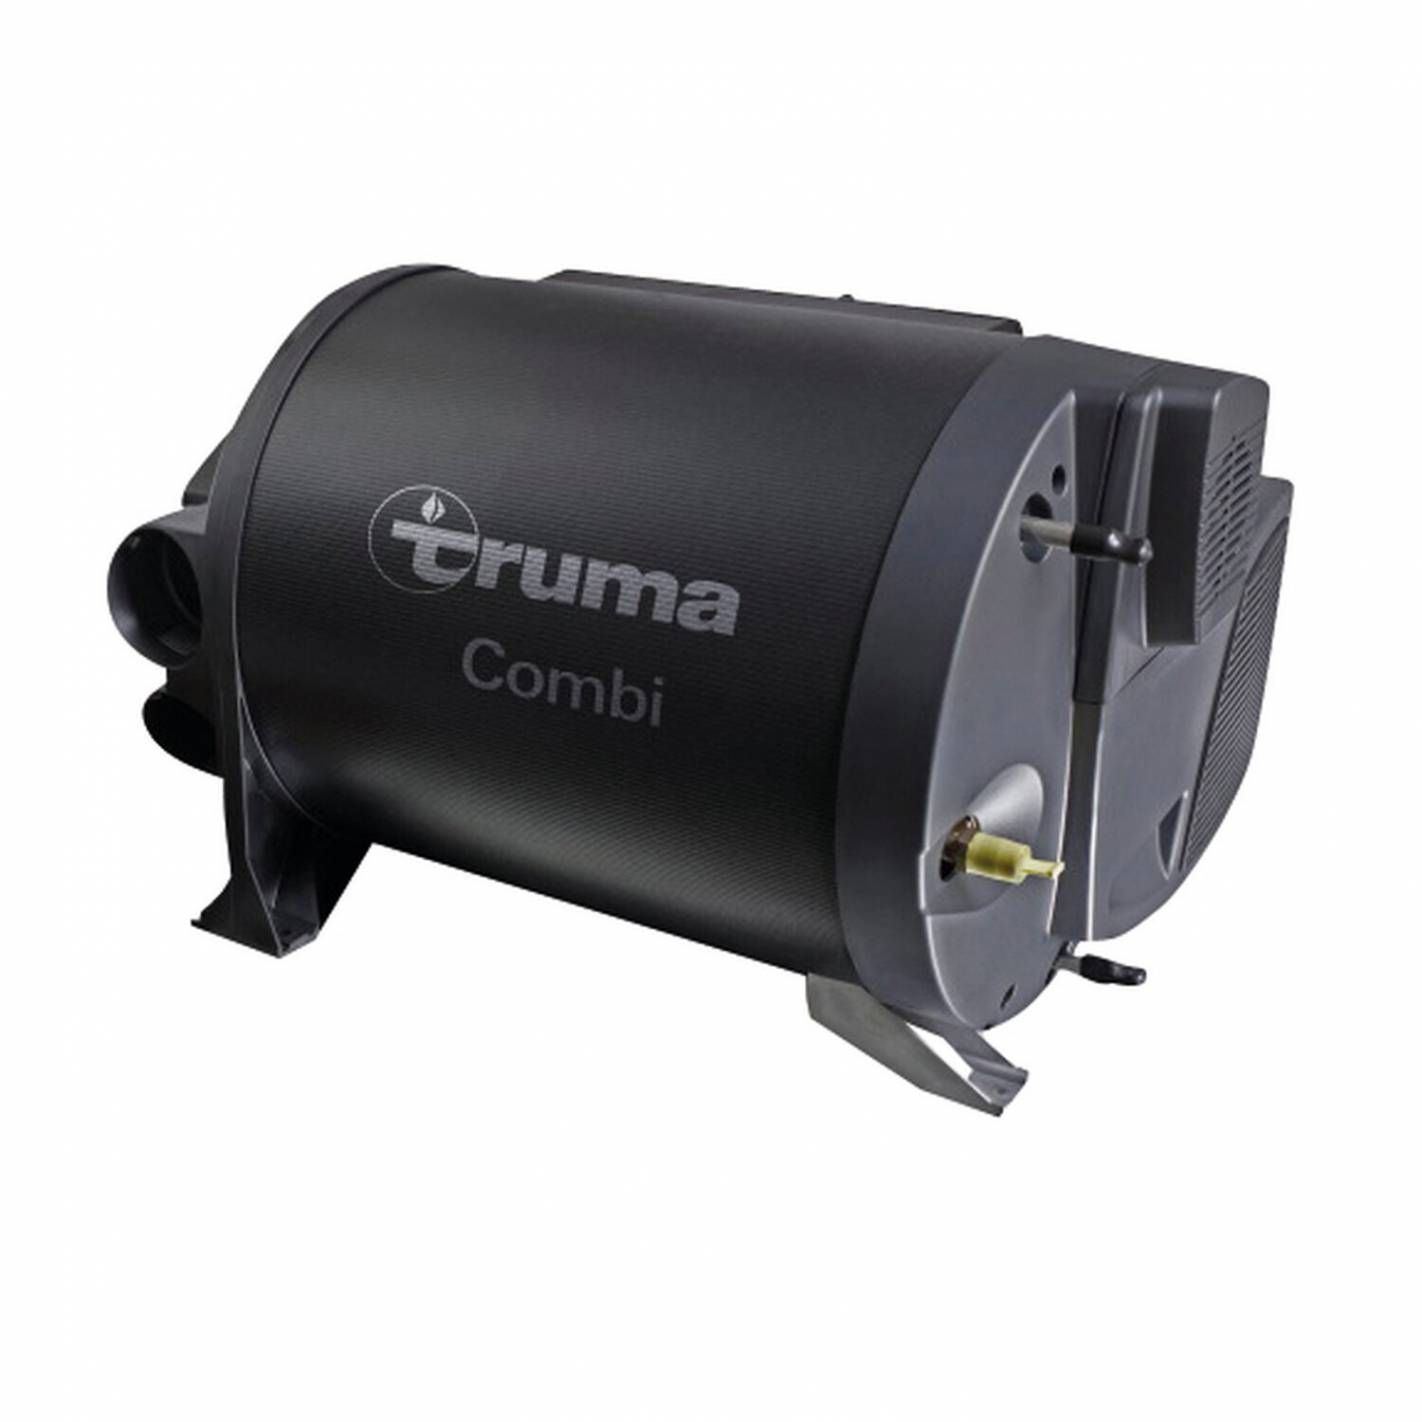 chauffage chauffe eau truma type combi 4 cp plus truma. Black Bedroom Furniture Sets. Home Design Ideas